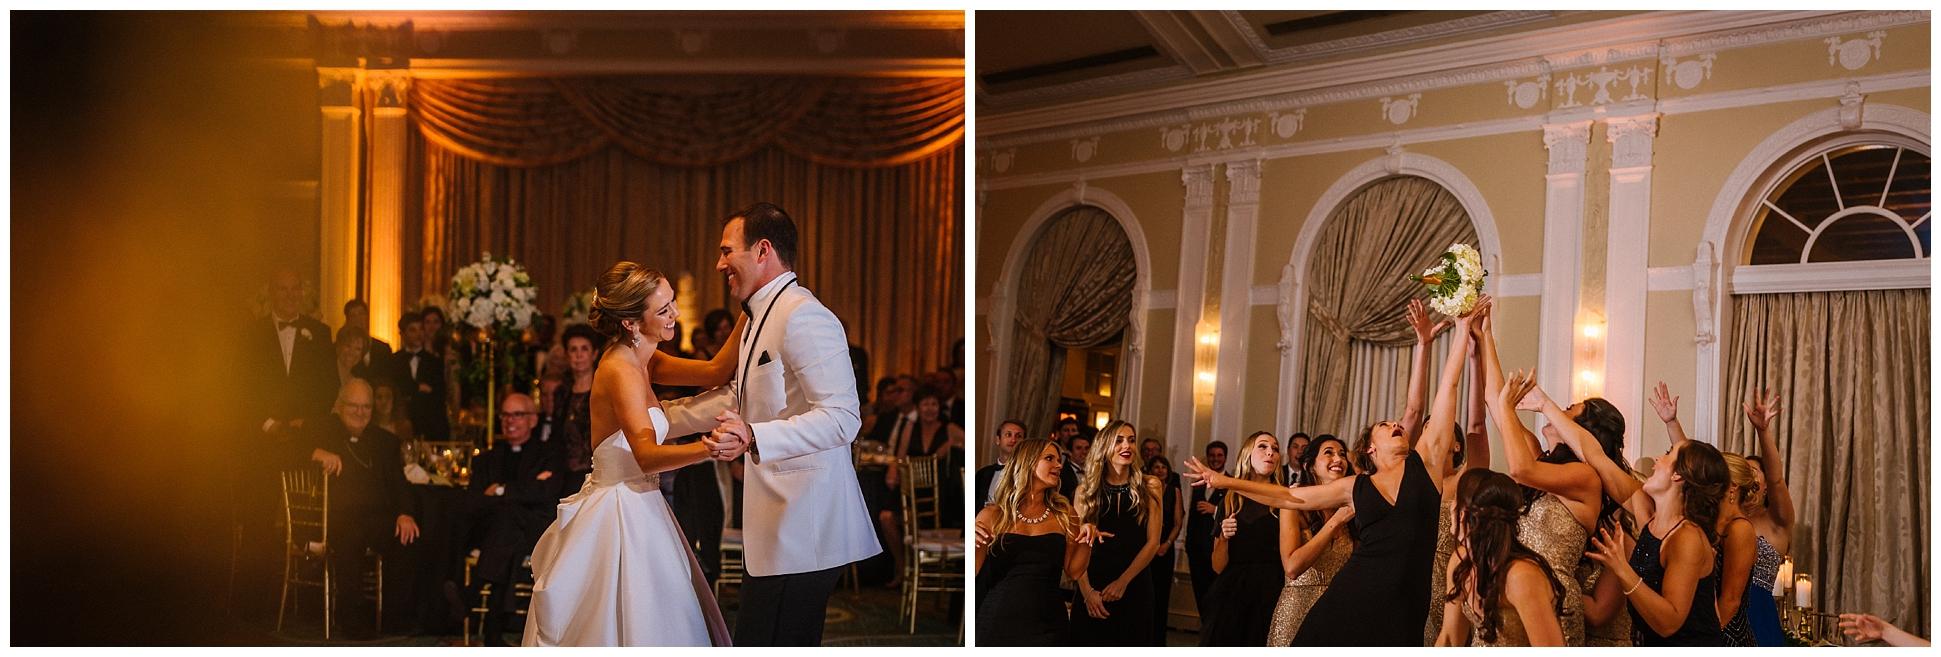 Ashlee-hamon-photography-year-in-review-2016-travel-wanderlust-vsco-adventure-wedding_0123.jpg